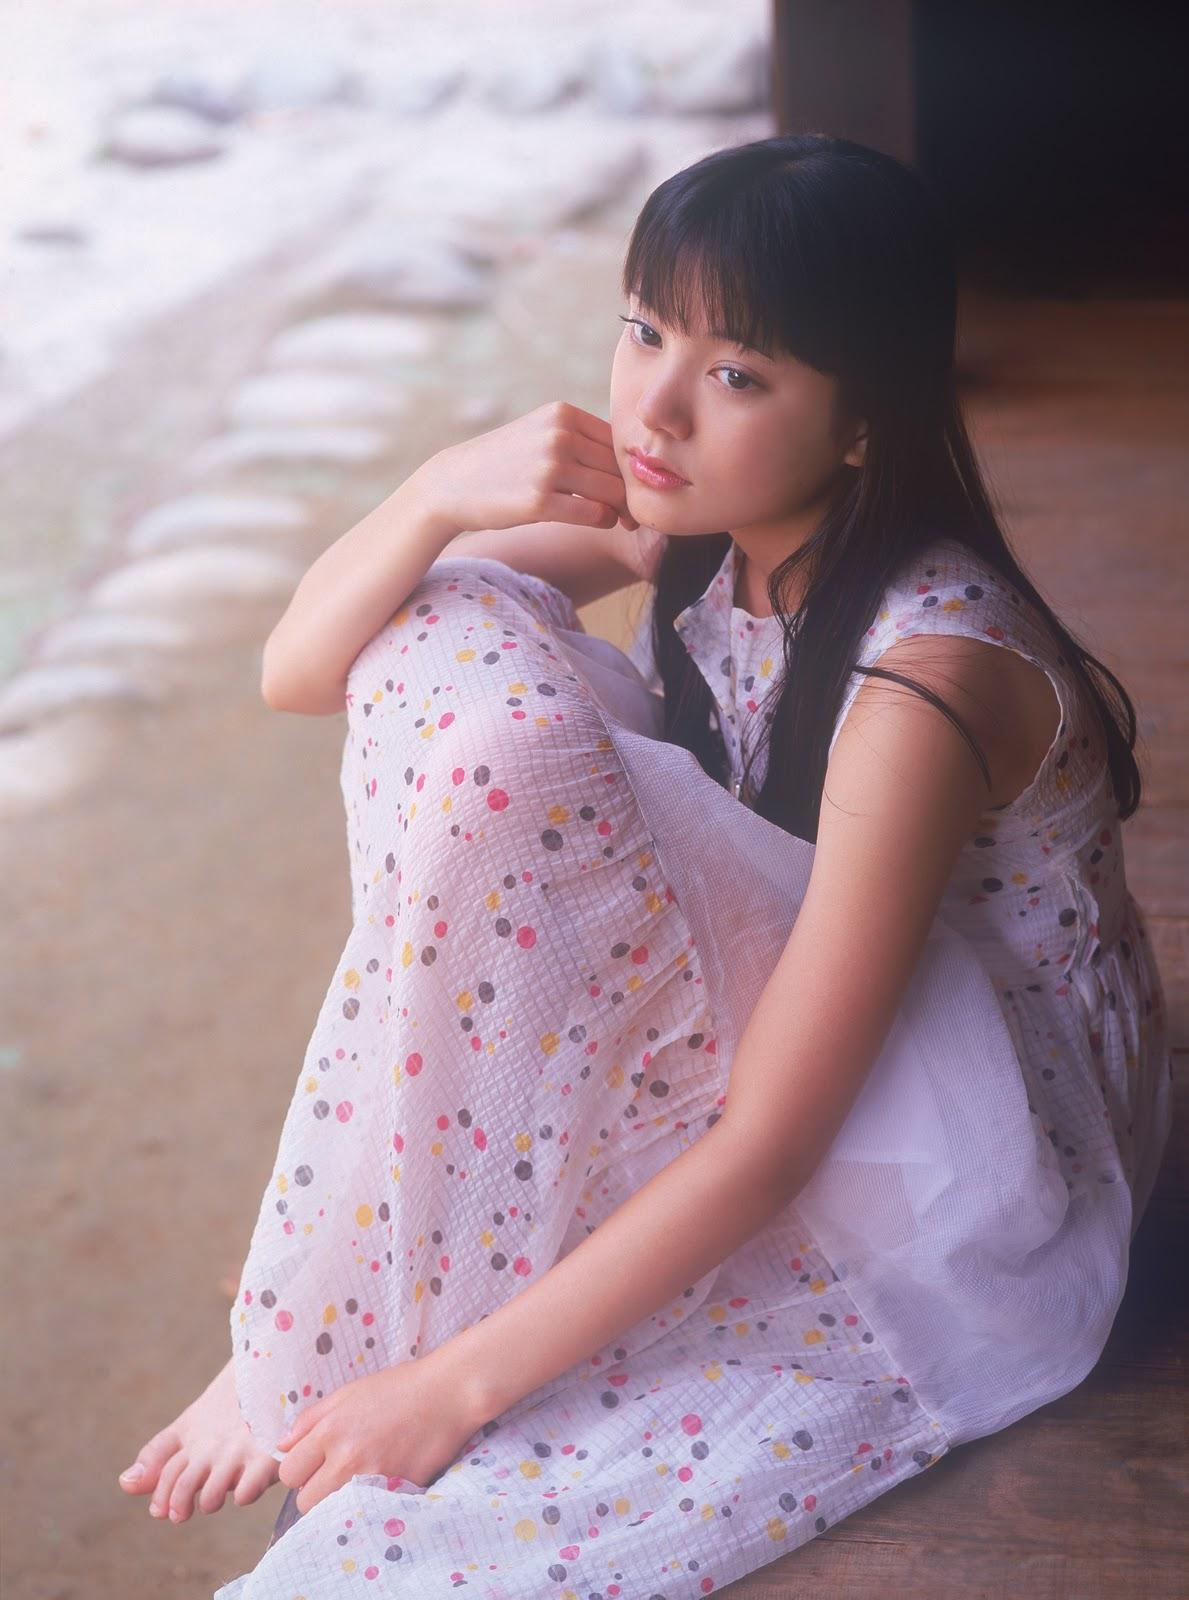 女優ブログ: Anne Suzuki (鈴木杏)